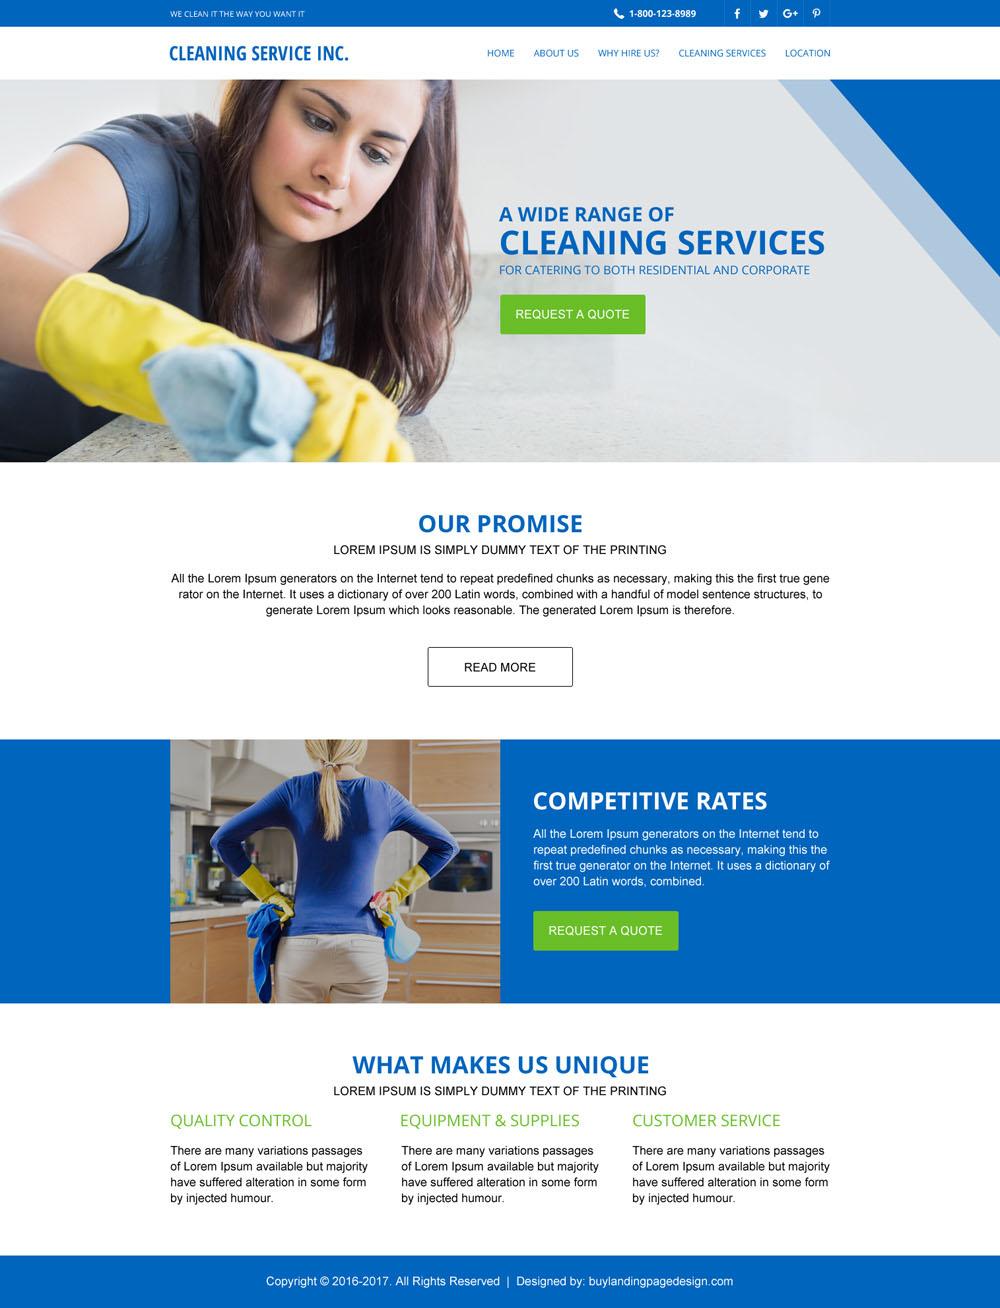 html website templates 20 flat off special discount offer. Black Bedroom Furniture Sets. Home Design Ideas